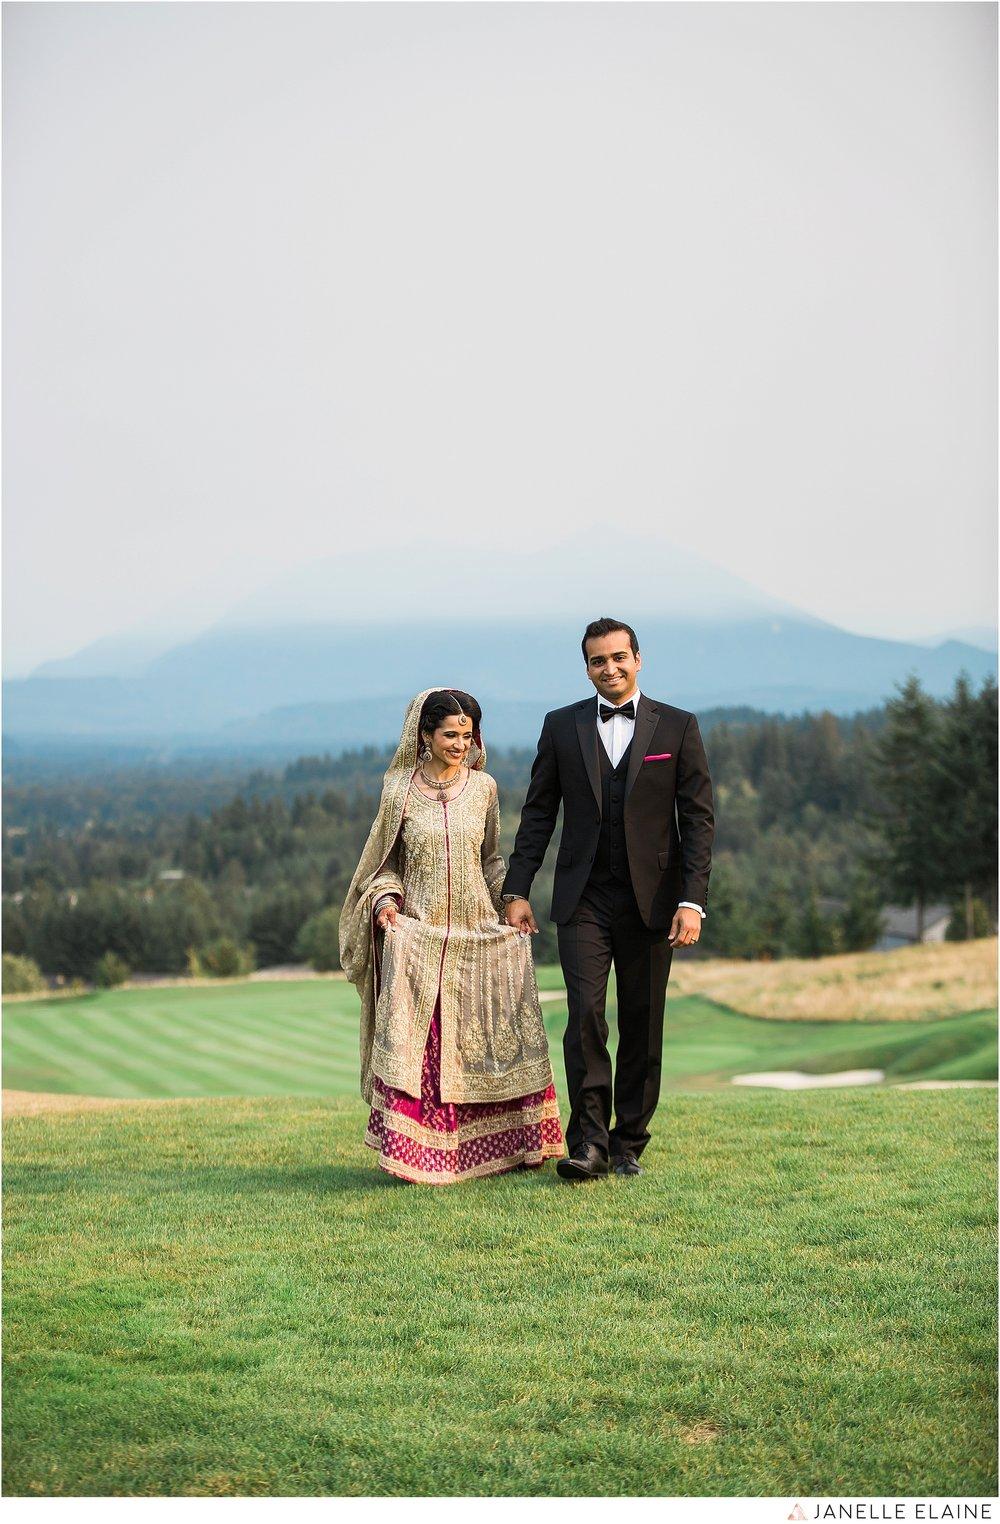 janelle elaine photography-the club at snoqualmie ridge-washington-wedding-photography-portraits-129.jpg